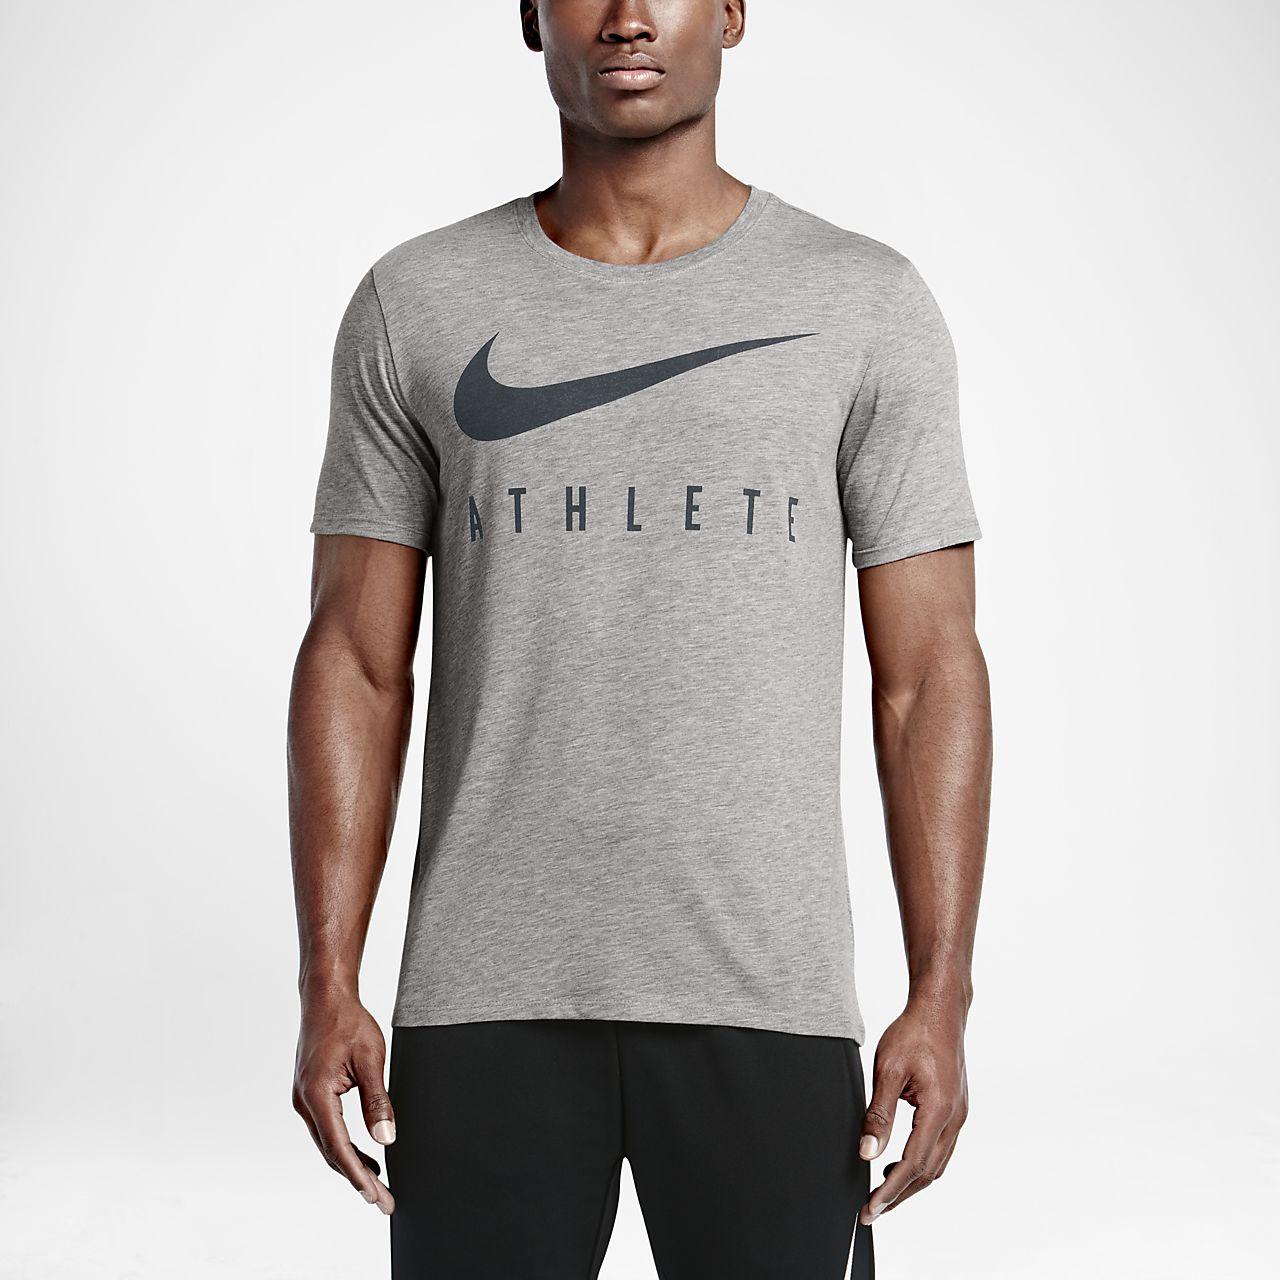 Nike Swoosh Athlete Men's T-Shirts Dark Grey Heather/Black